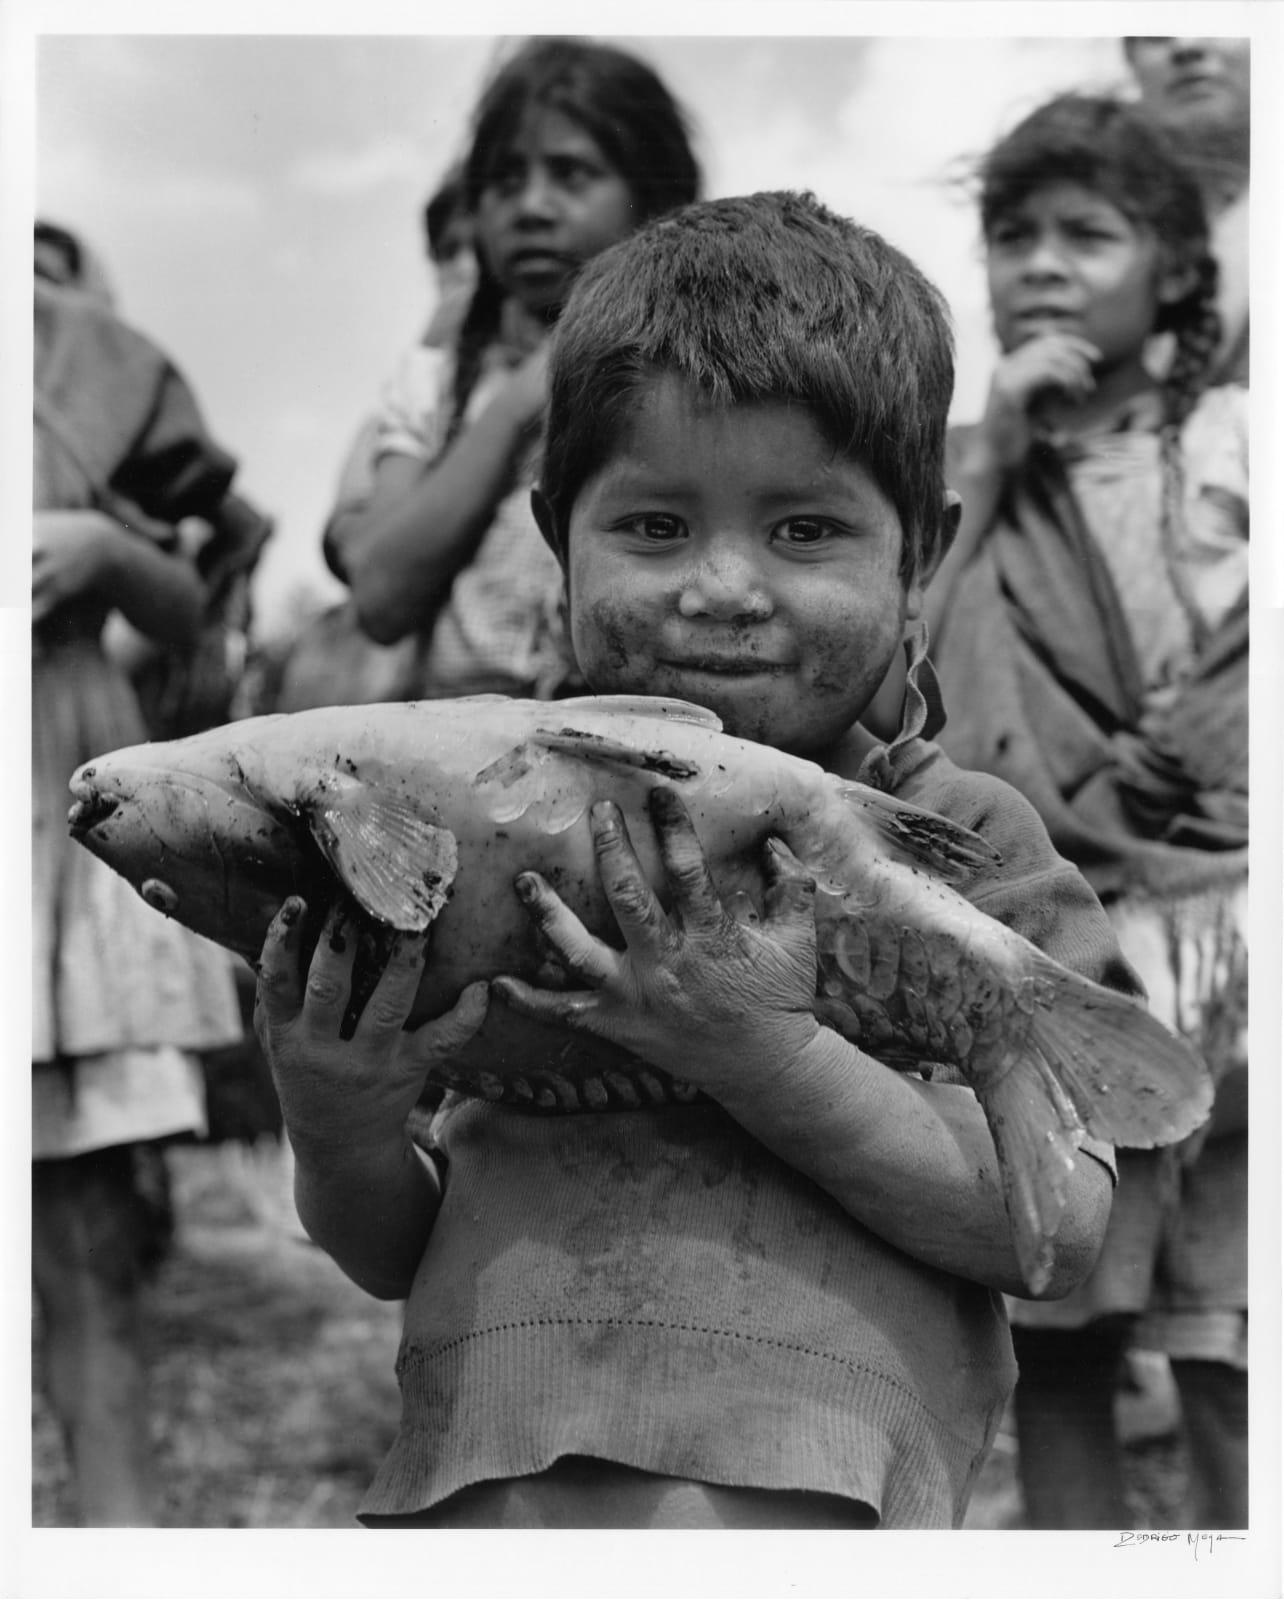 Rodrigo Moya - La Pesca Milagrosa, Opopeo, Michoacan, 1970